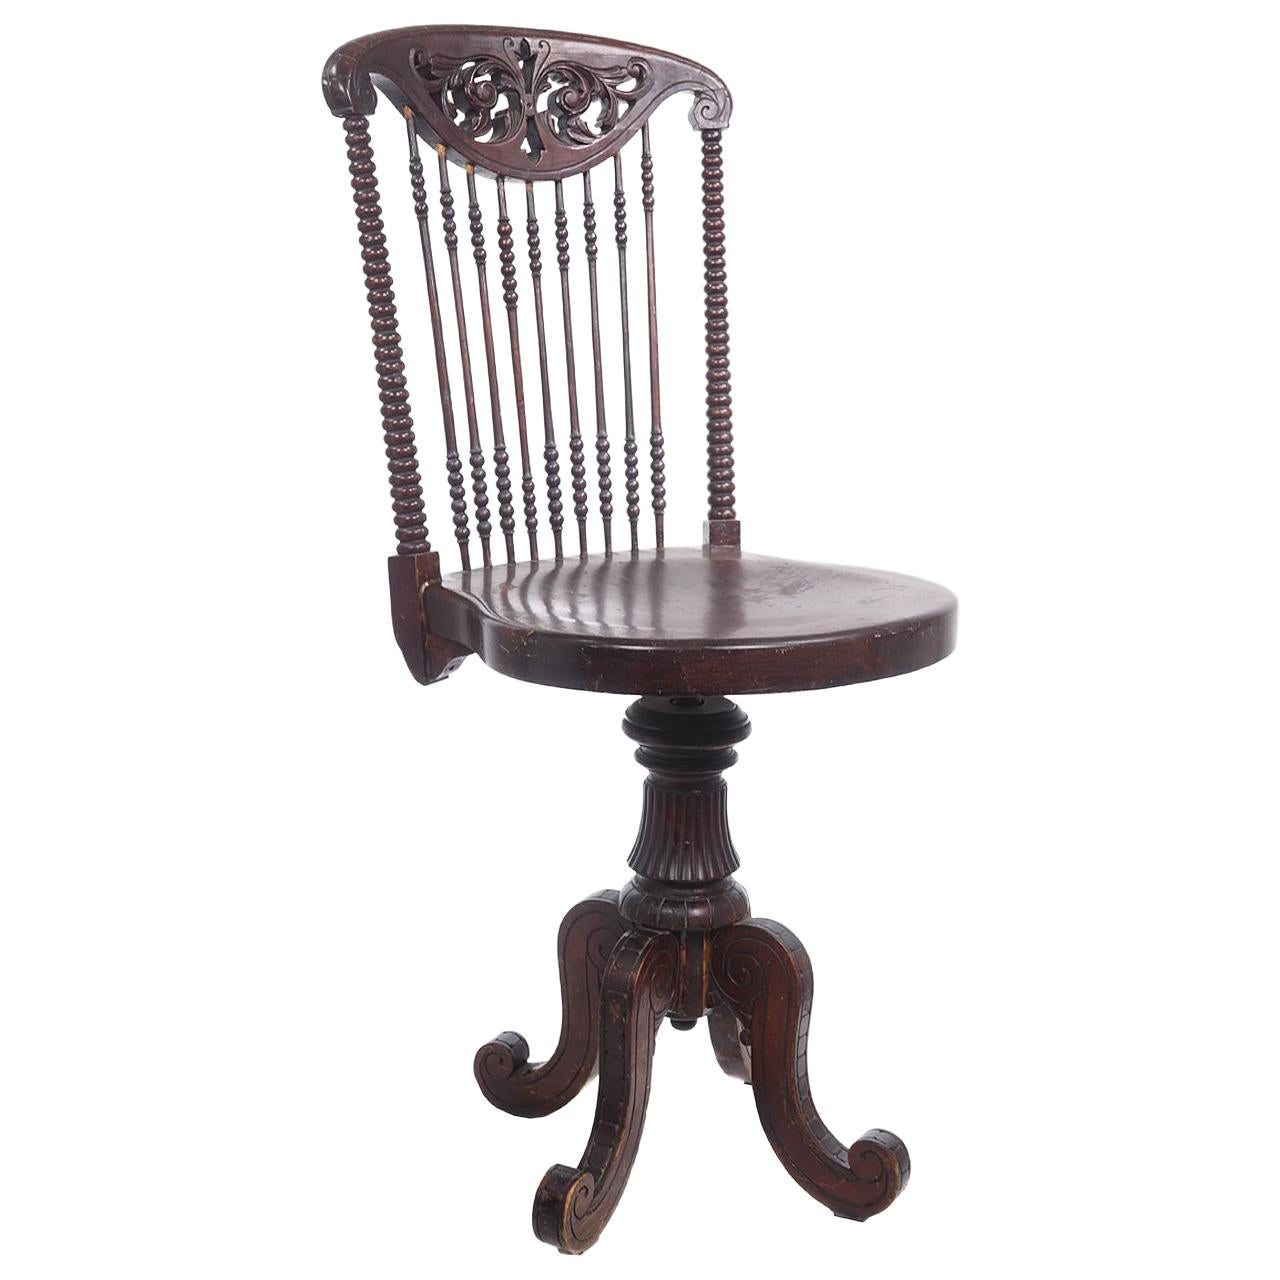 Victorian Piano or Desk Chair